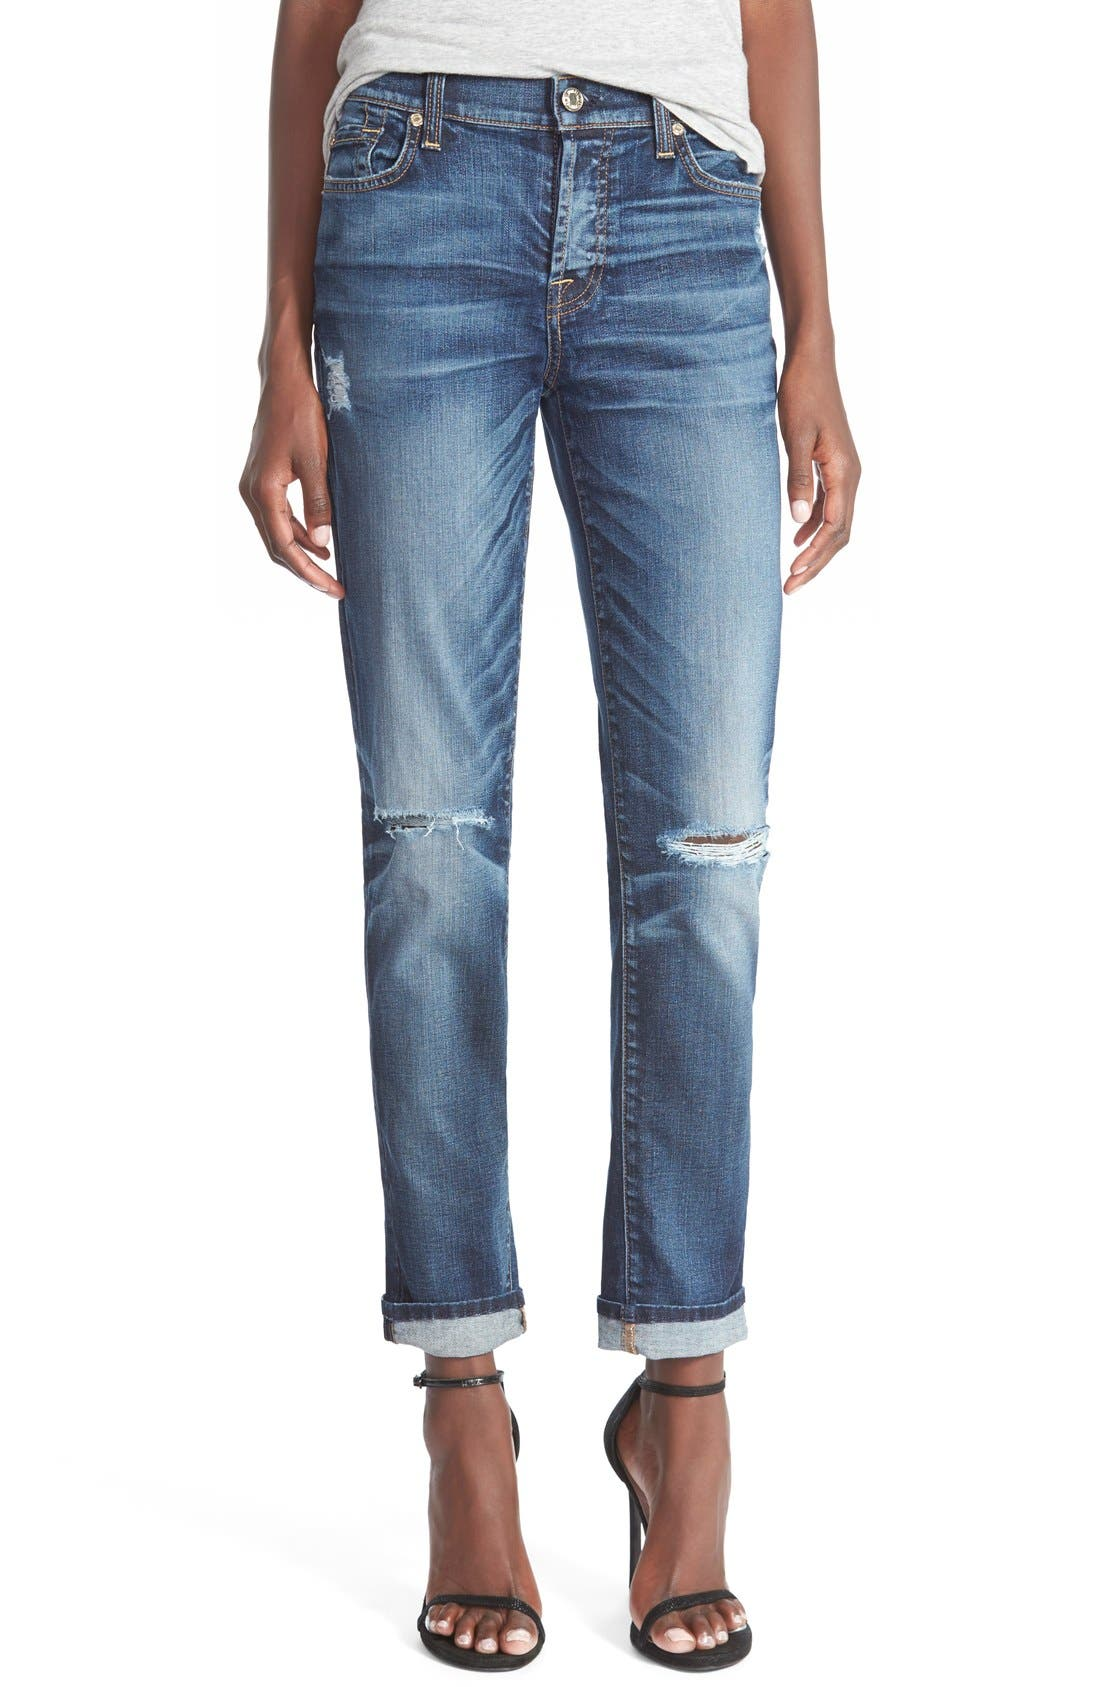 Main Image - 7 For All Mankind® 'Josefina' Mid Rise Boyfriend Jeans (Marie Vintage Blue 3)